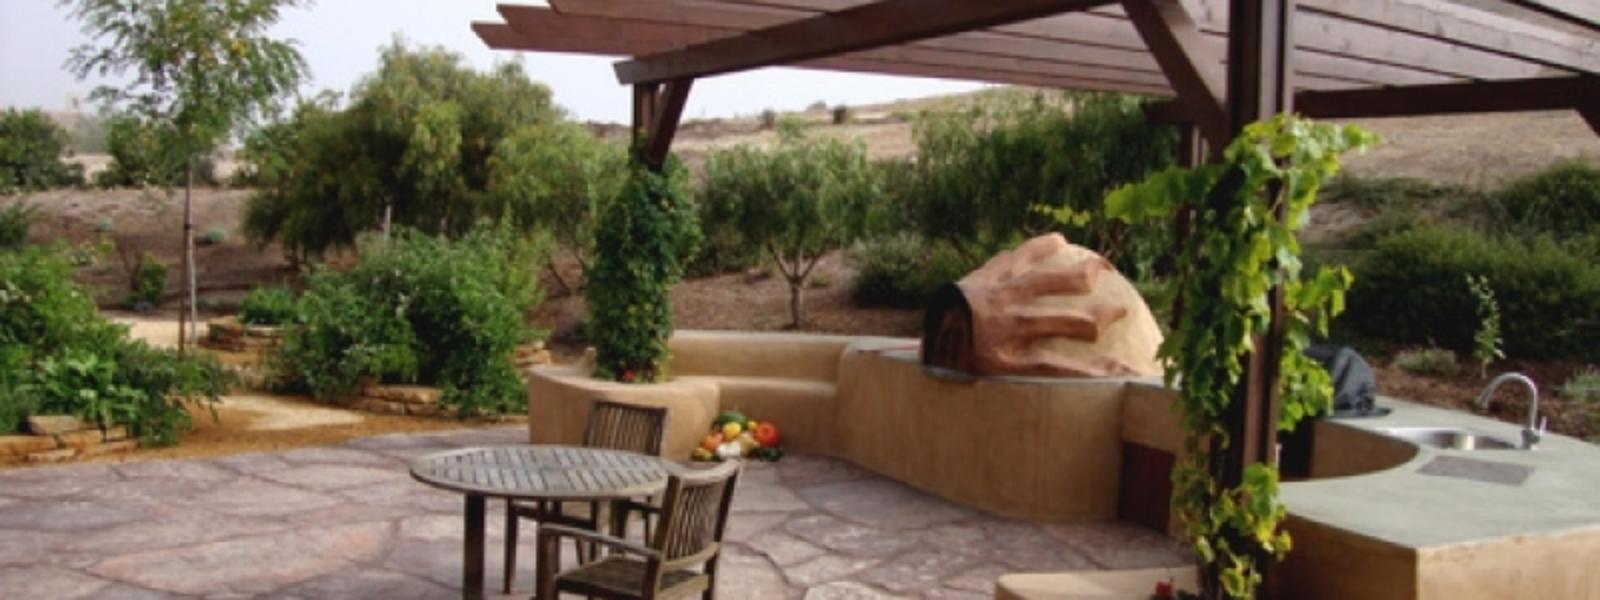 San Luis Obispo Botanical Garden Presents Build An Earth Oven Weekend Works